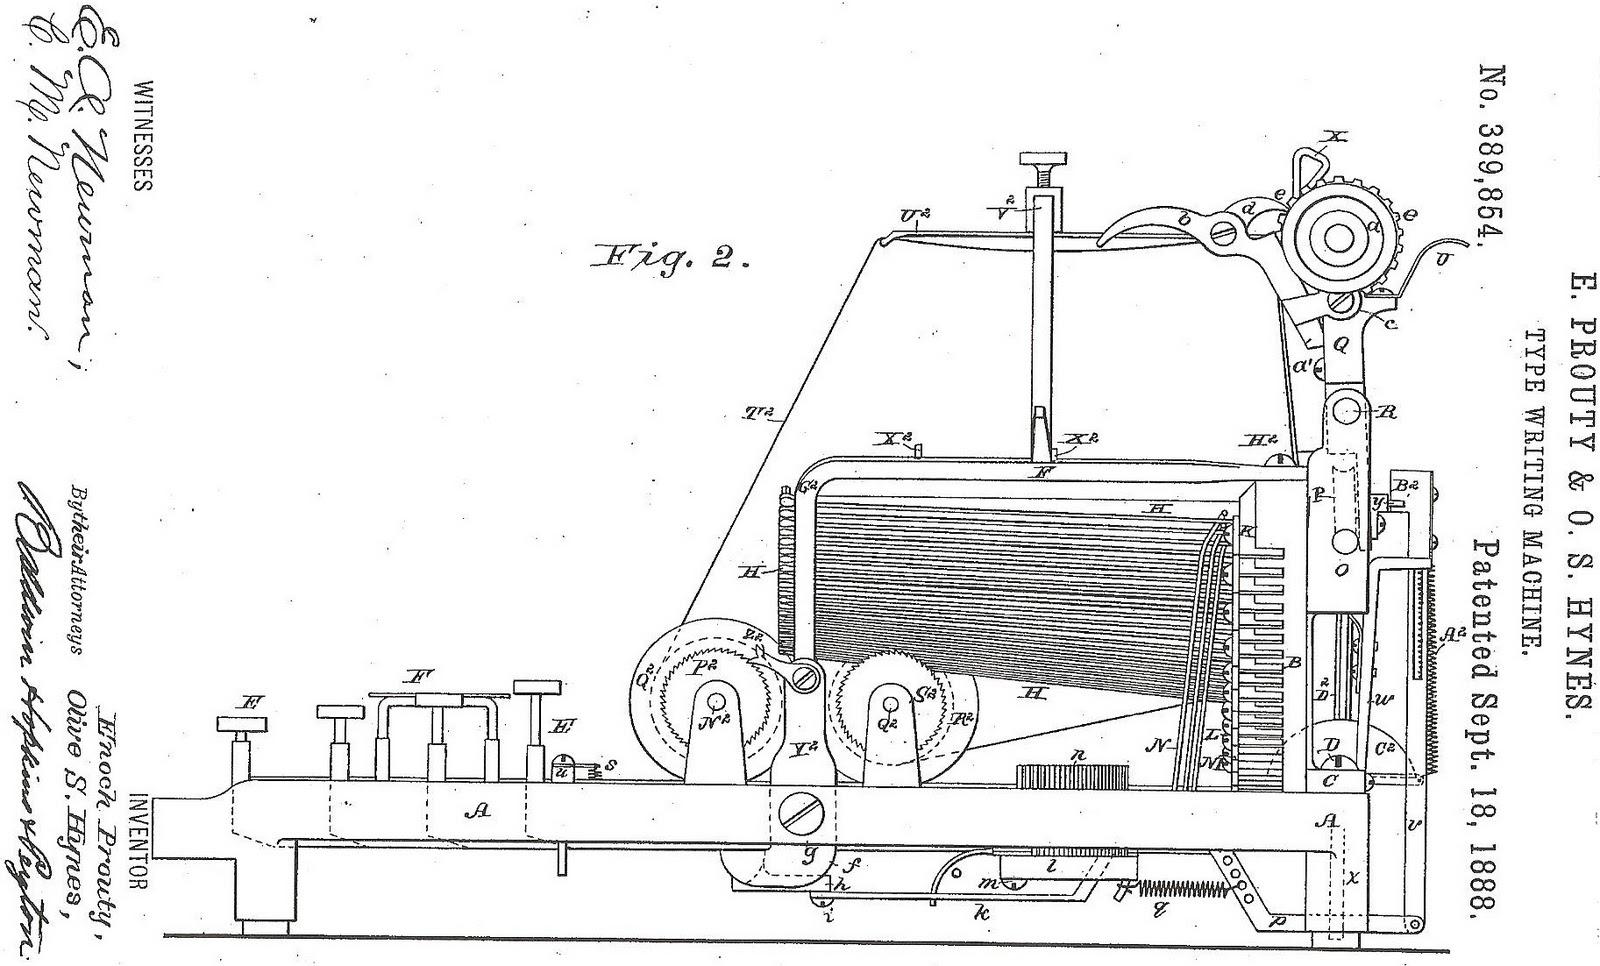 Oz Typewriter On This Day In Typewriter History Cxxi